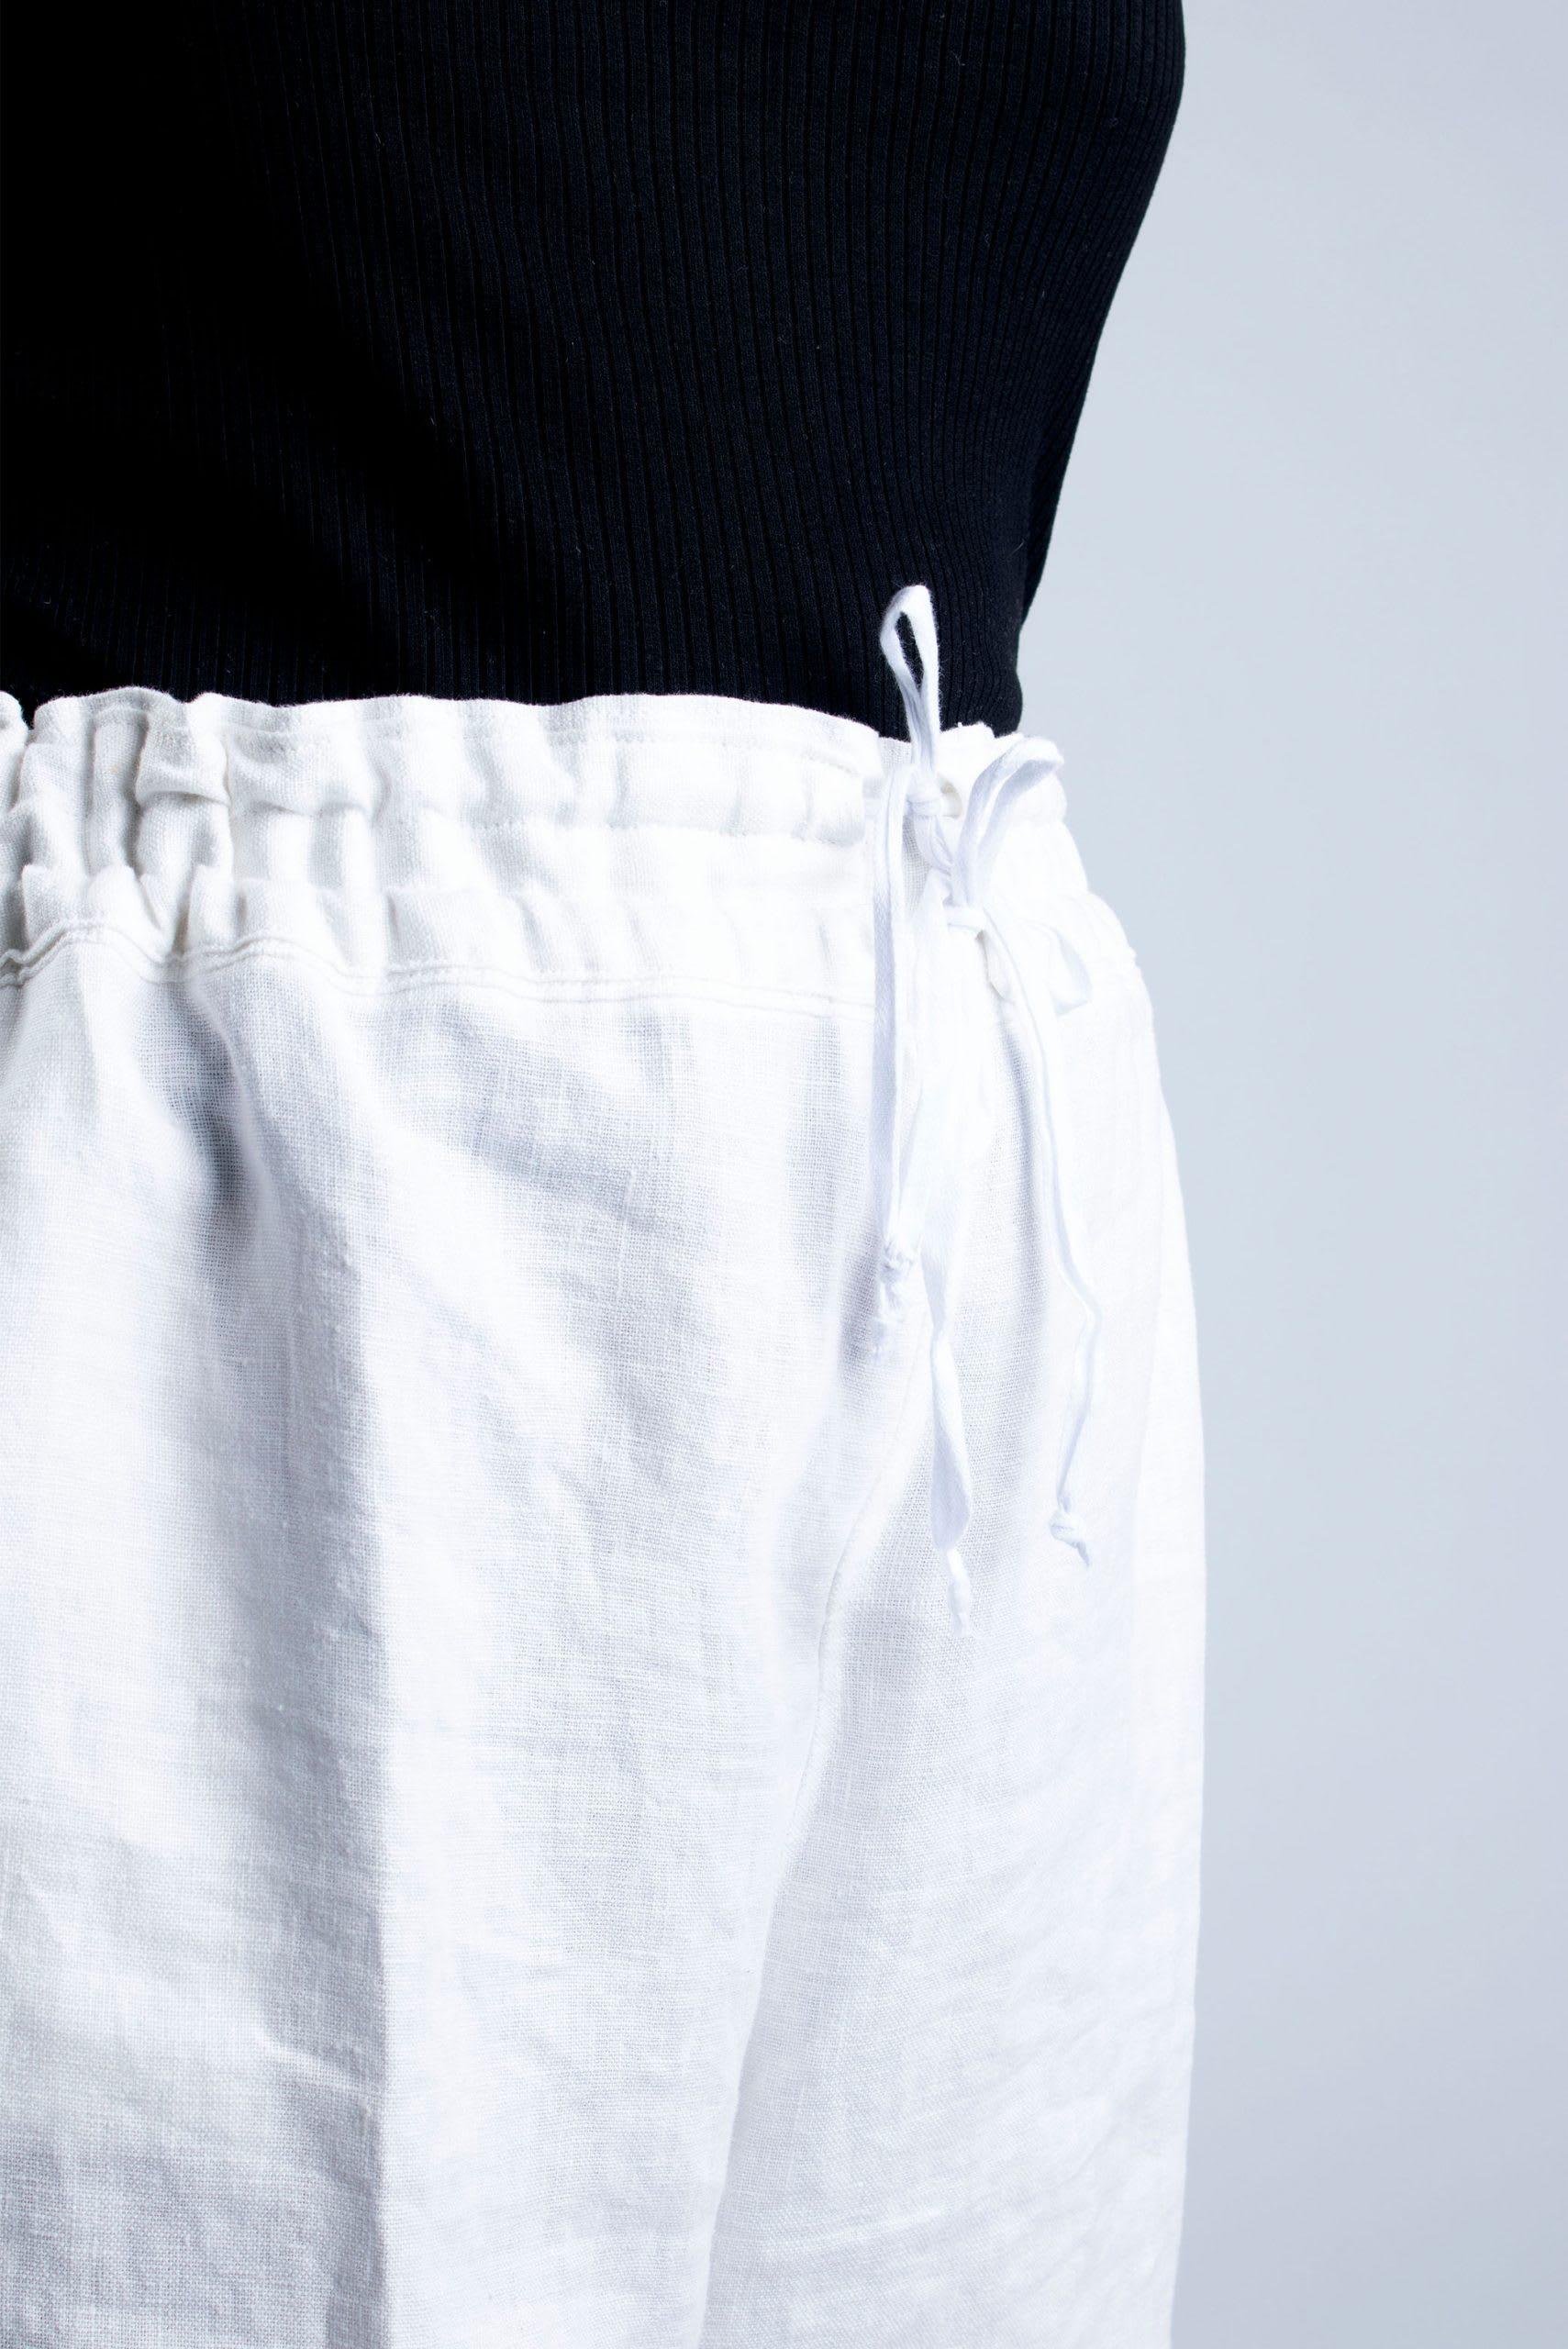 detail of drawstring on white linen shorts